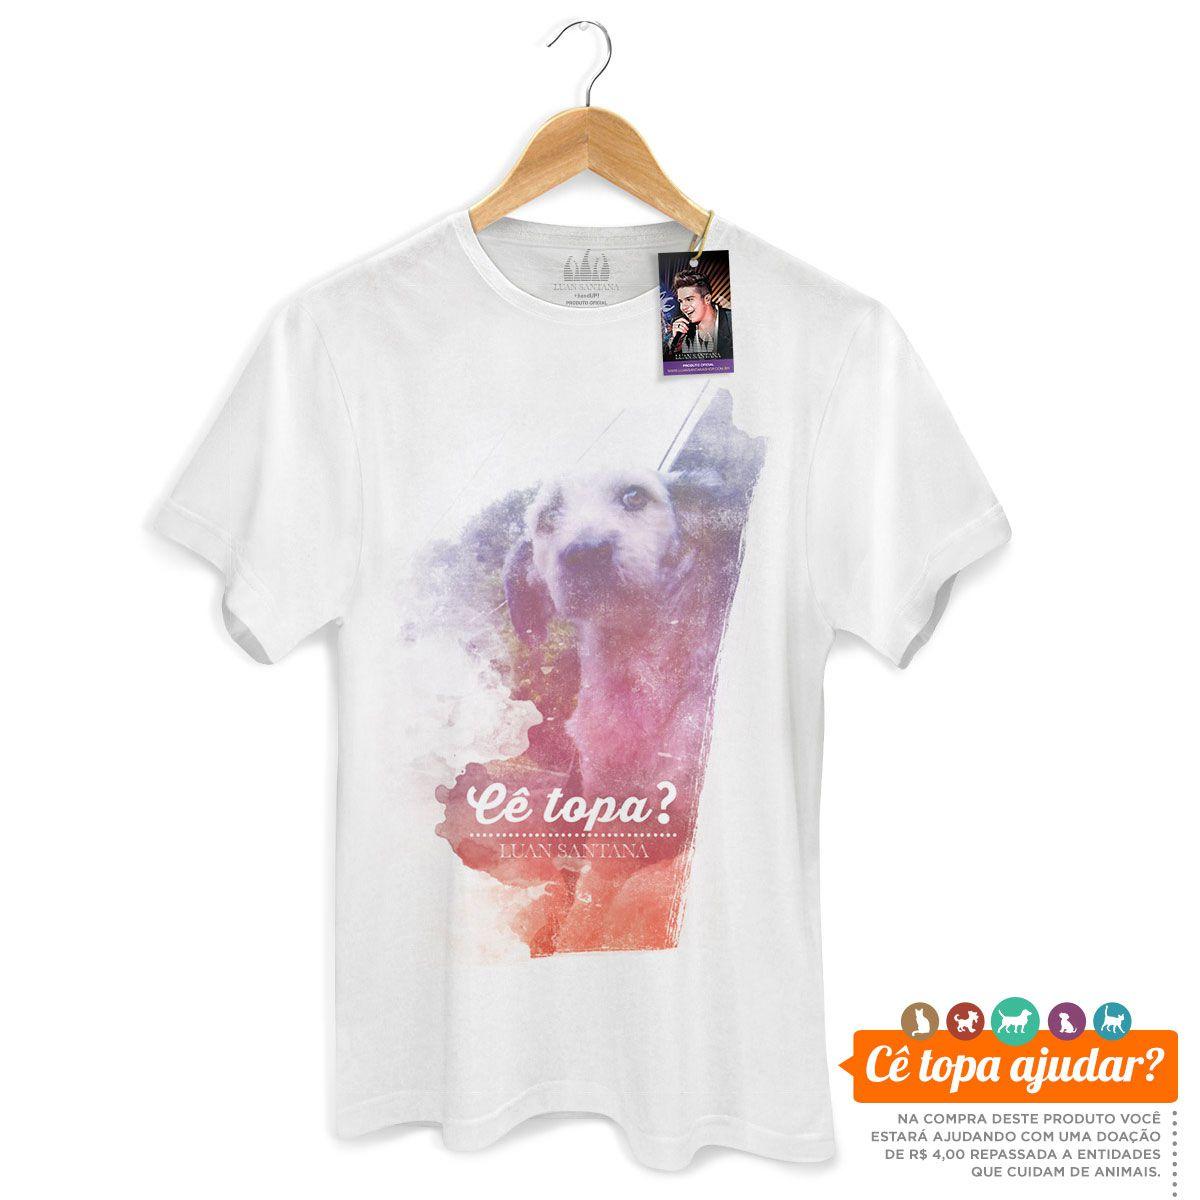 Camiseta Masculina Luan Santana Cê Topa Me Levar Pra Casa? Feelings